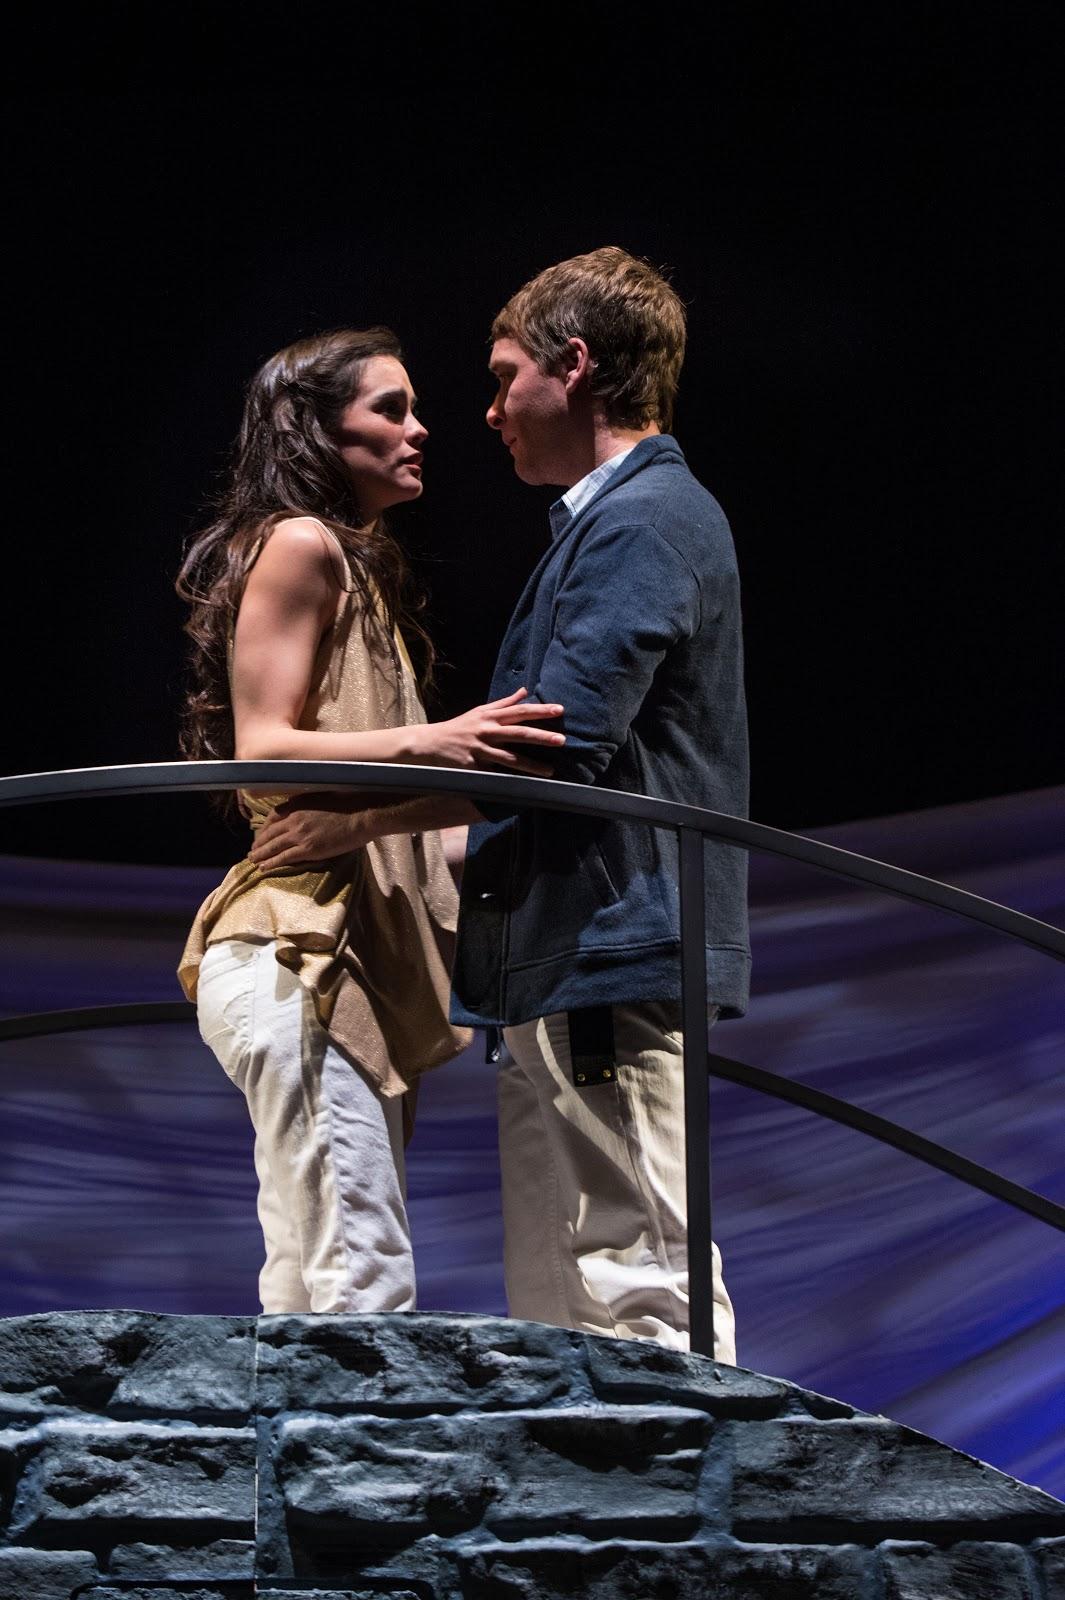 Melisa Pereyra (left) as Juliet and Chris Klopatek as Romeo in the Utah ShakespeareFestival's Romeo and Juliet.